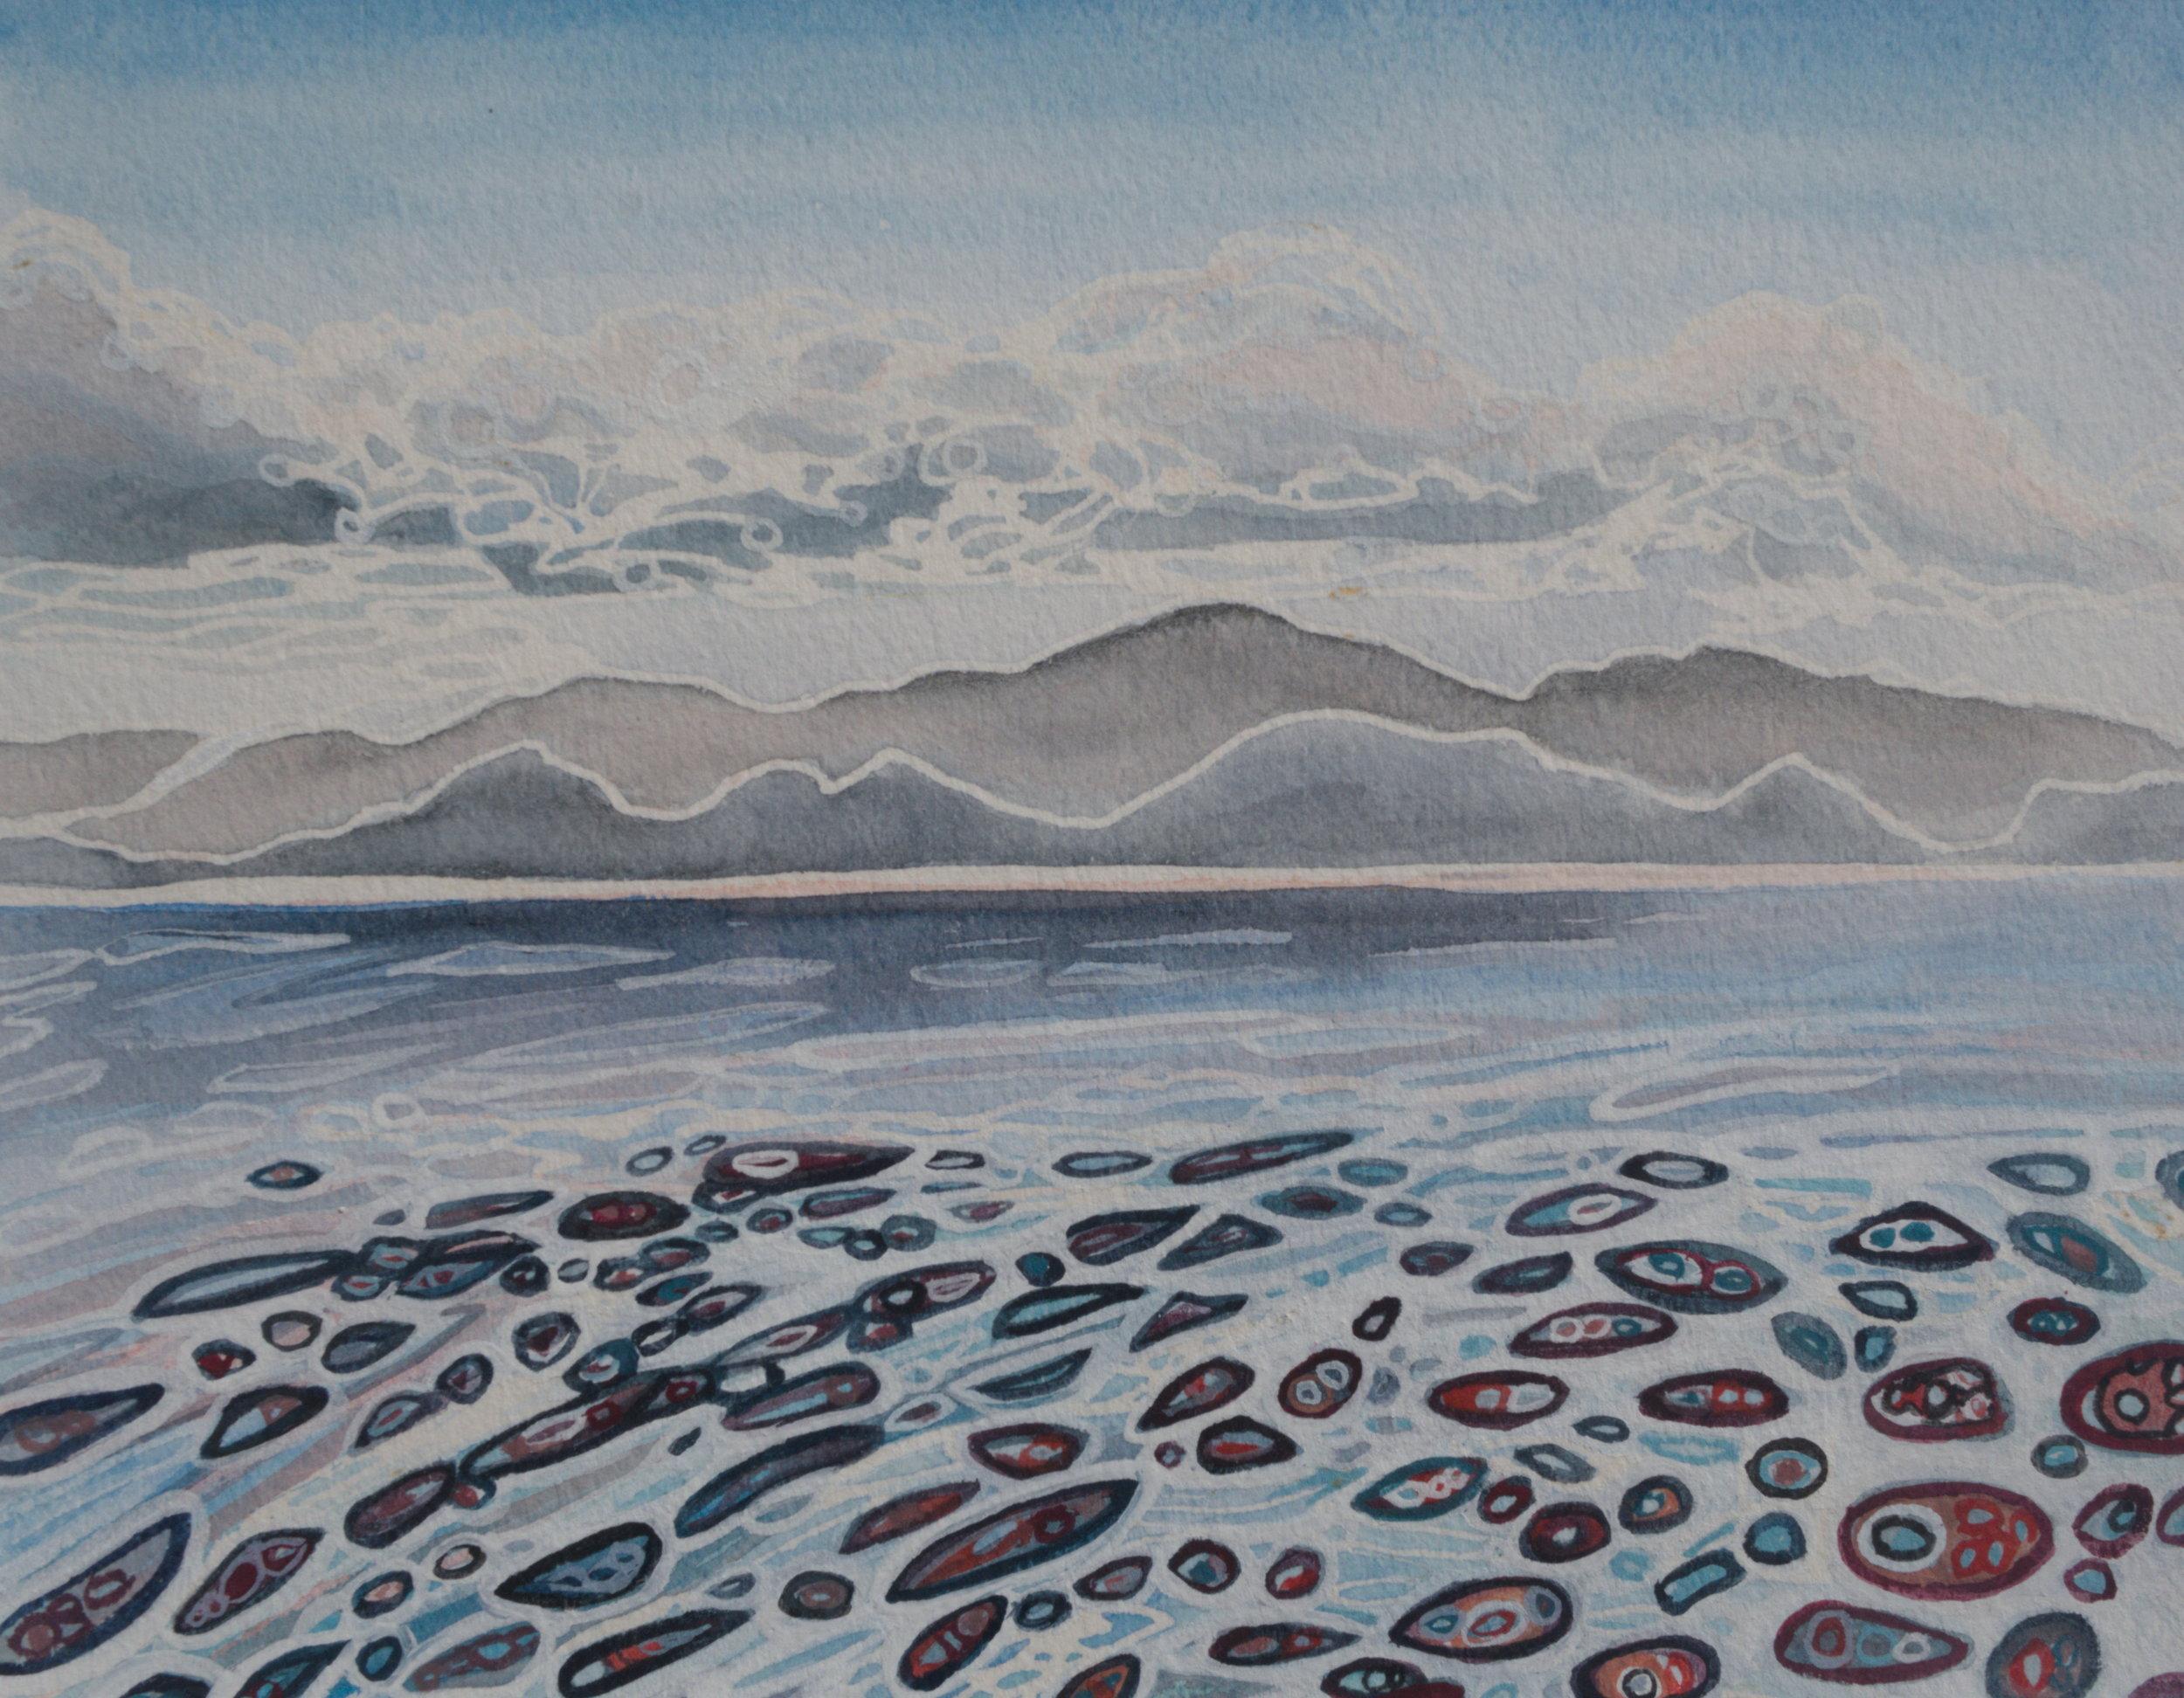 Deanne Haddow_Lembongan Villa View_2018_Watercolour and Gouache on paper_30x38cm.jpg